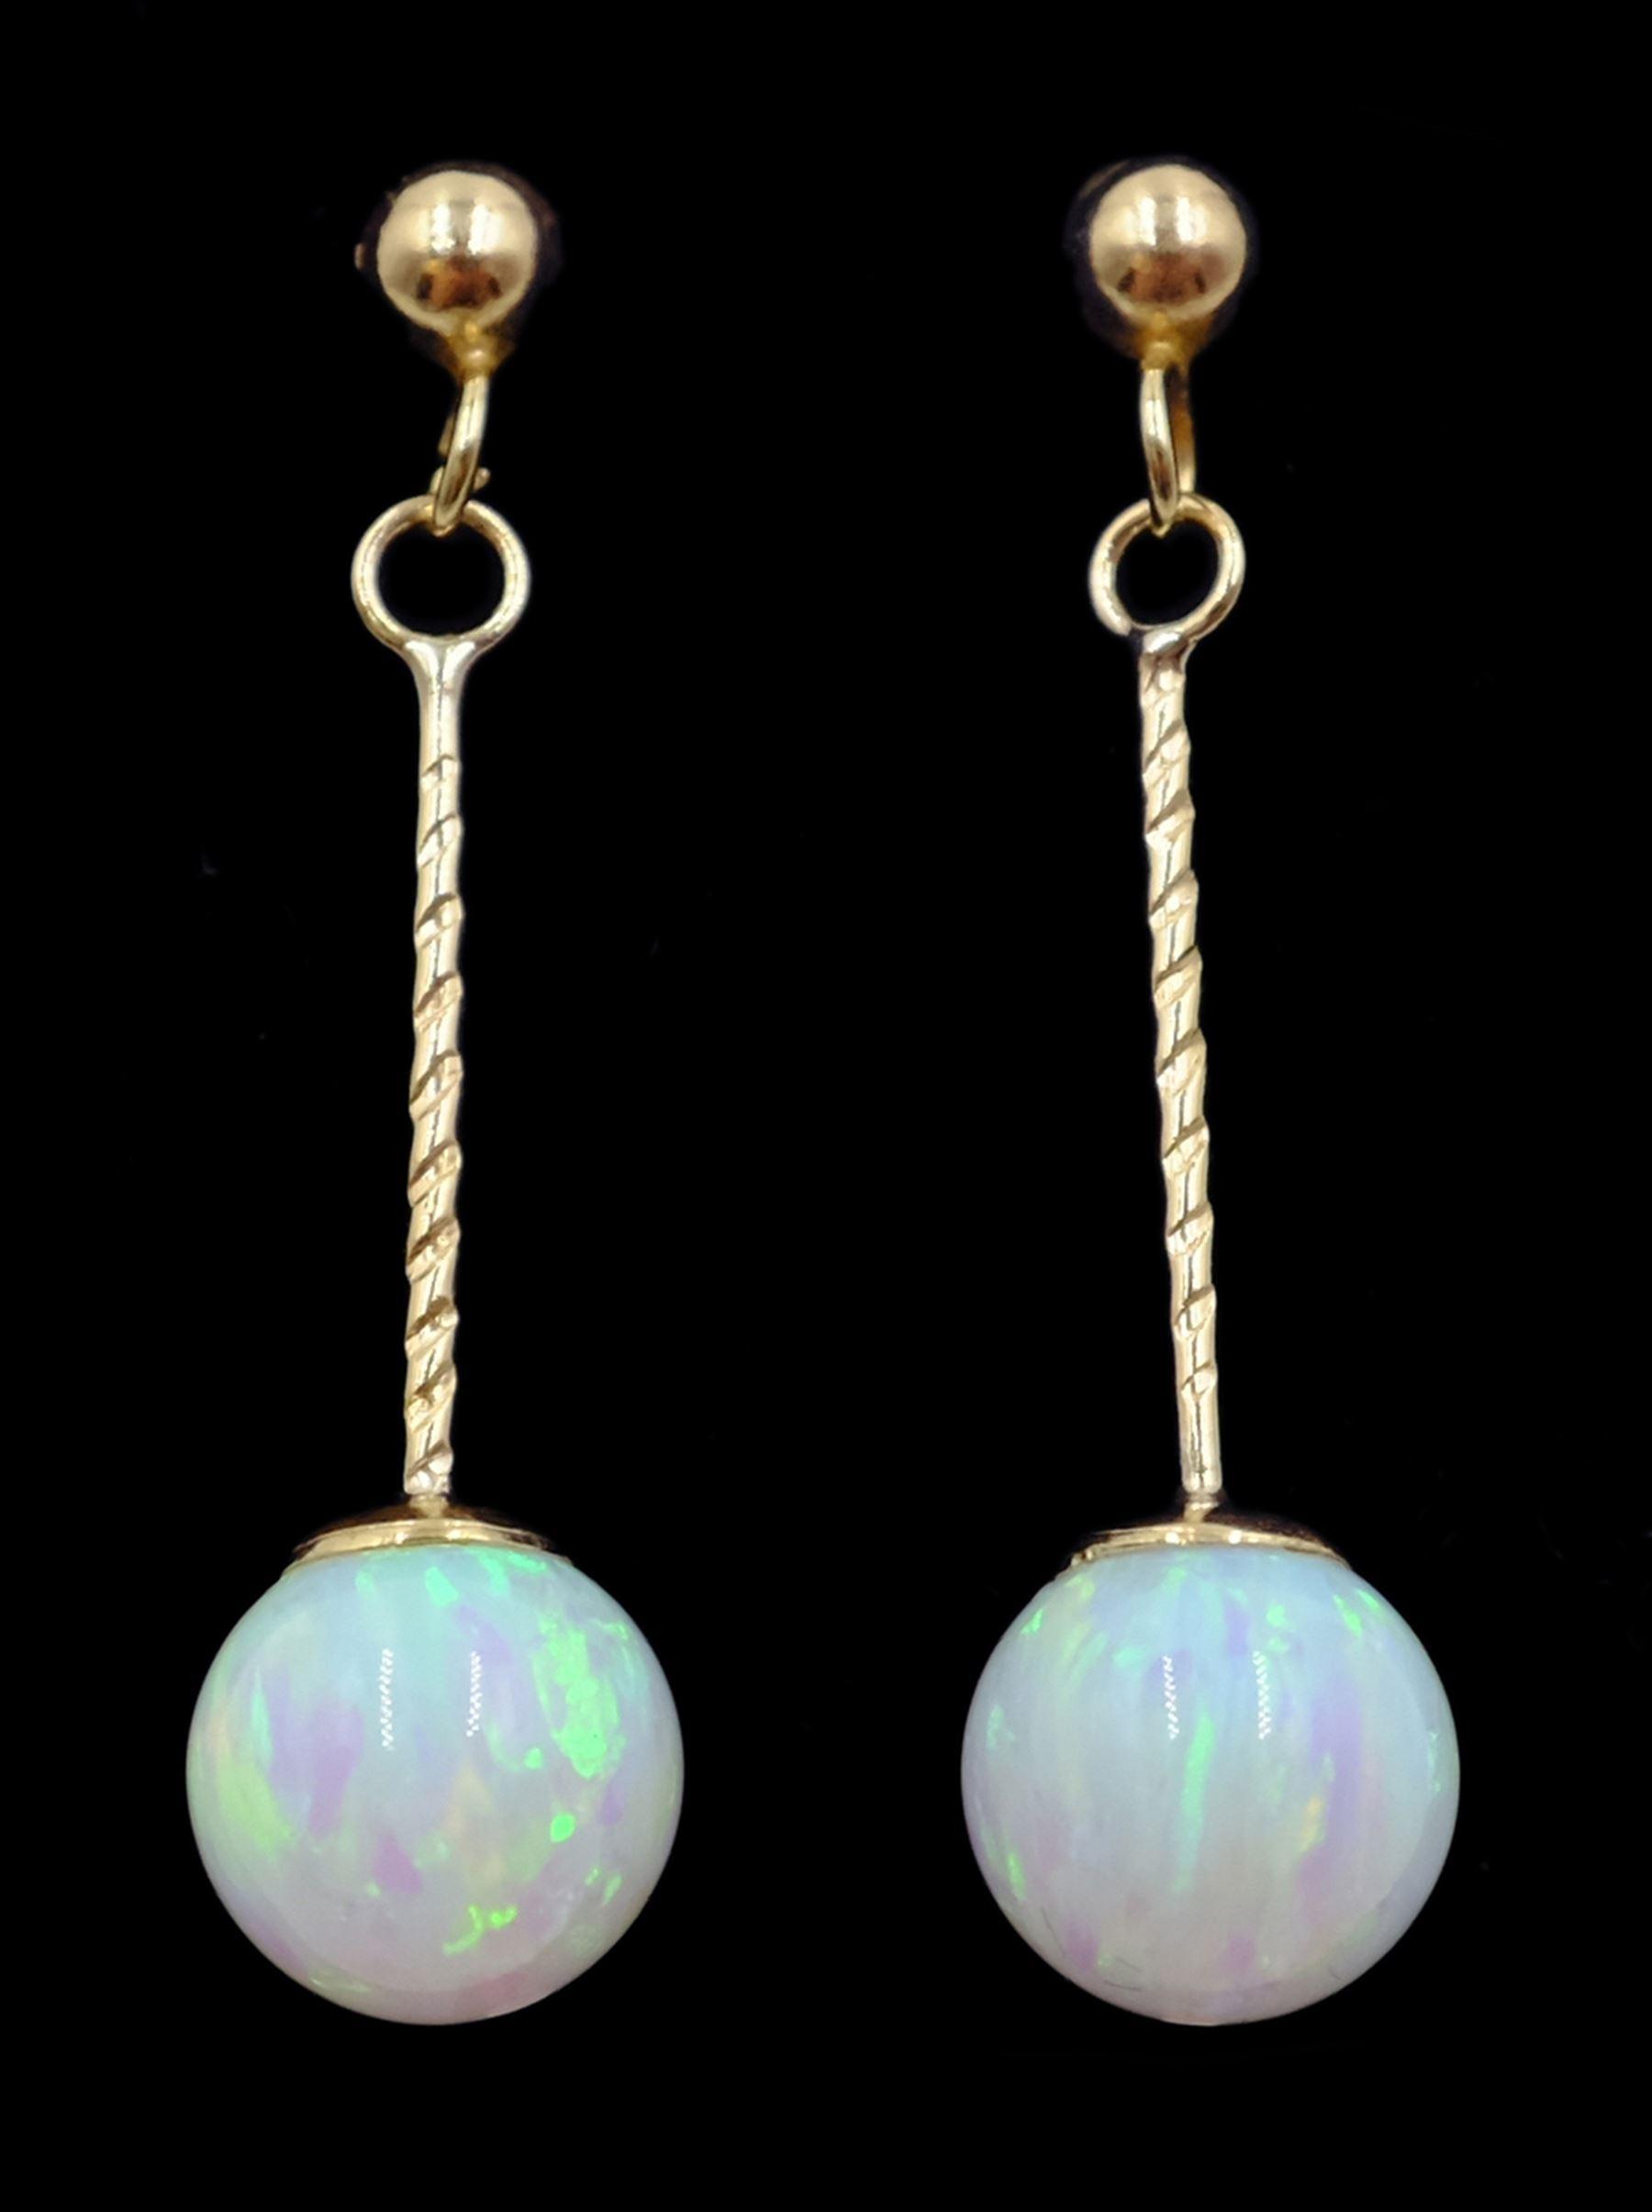 Pair of 9ct gold opal pendant earrings